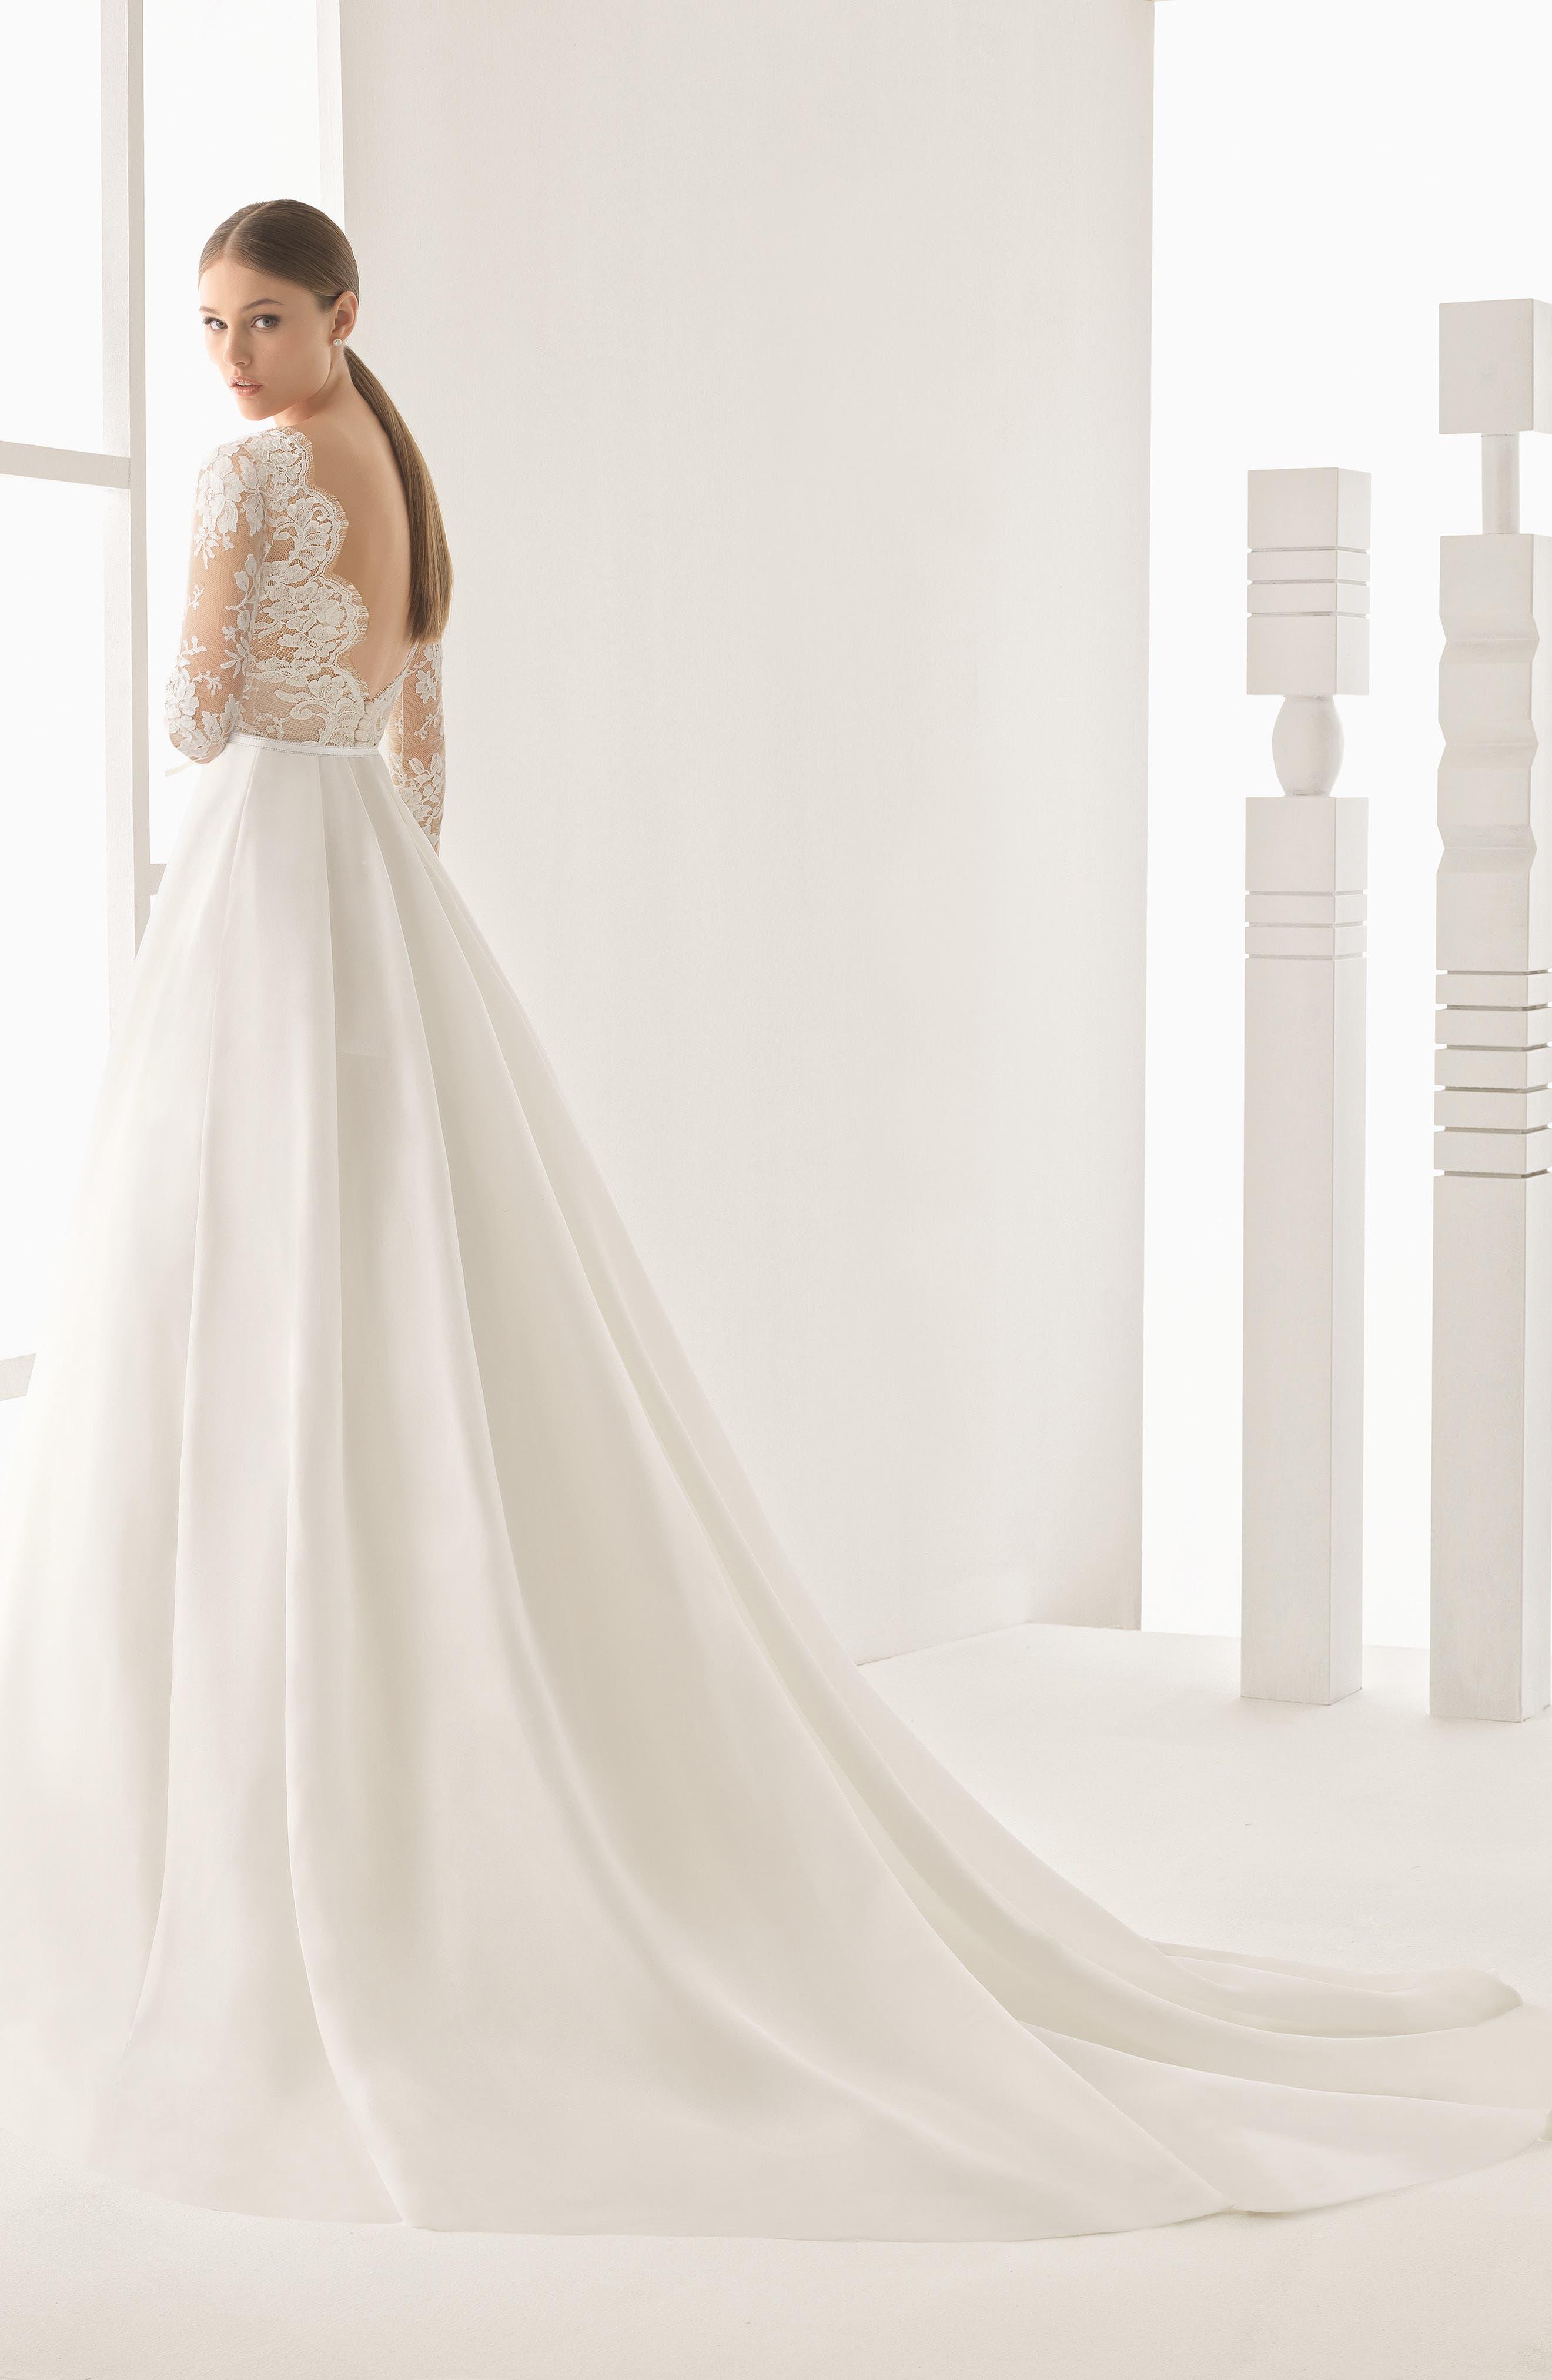 Womens silk wedding dresses bridal gowns nordstrom ombrellifo Gallery